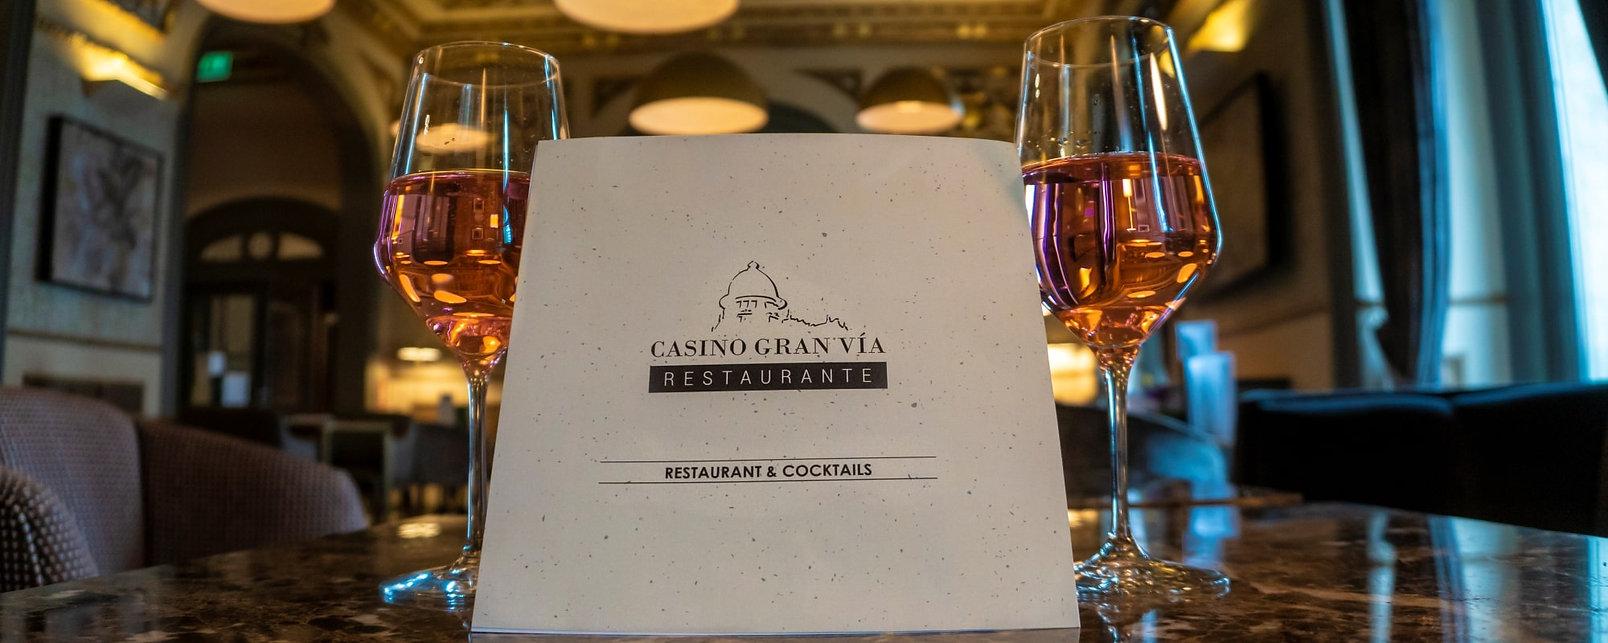 Restaurante_Casino_Gran_Vía_-_GastroMadr